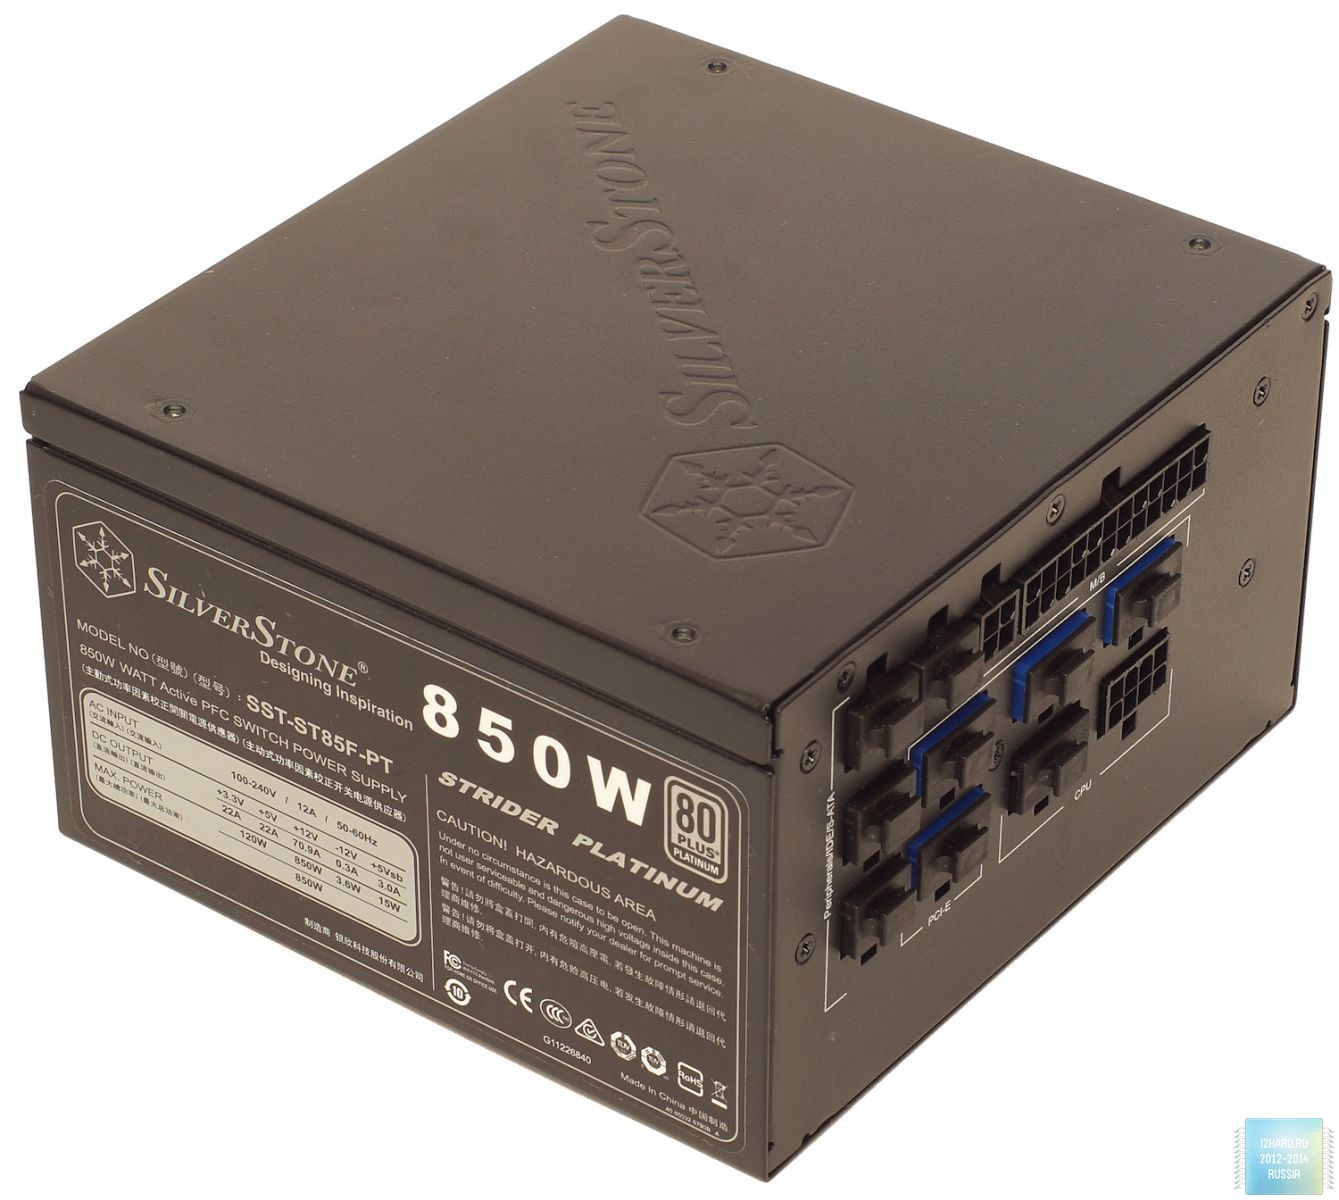 Внешний вид блока питания SilverStone Strider Platinum ST85F-PT (850 Вт)